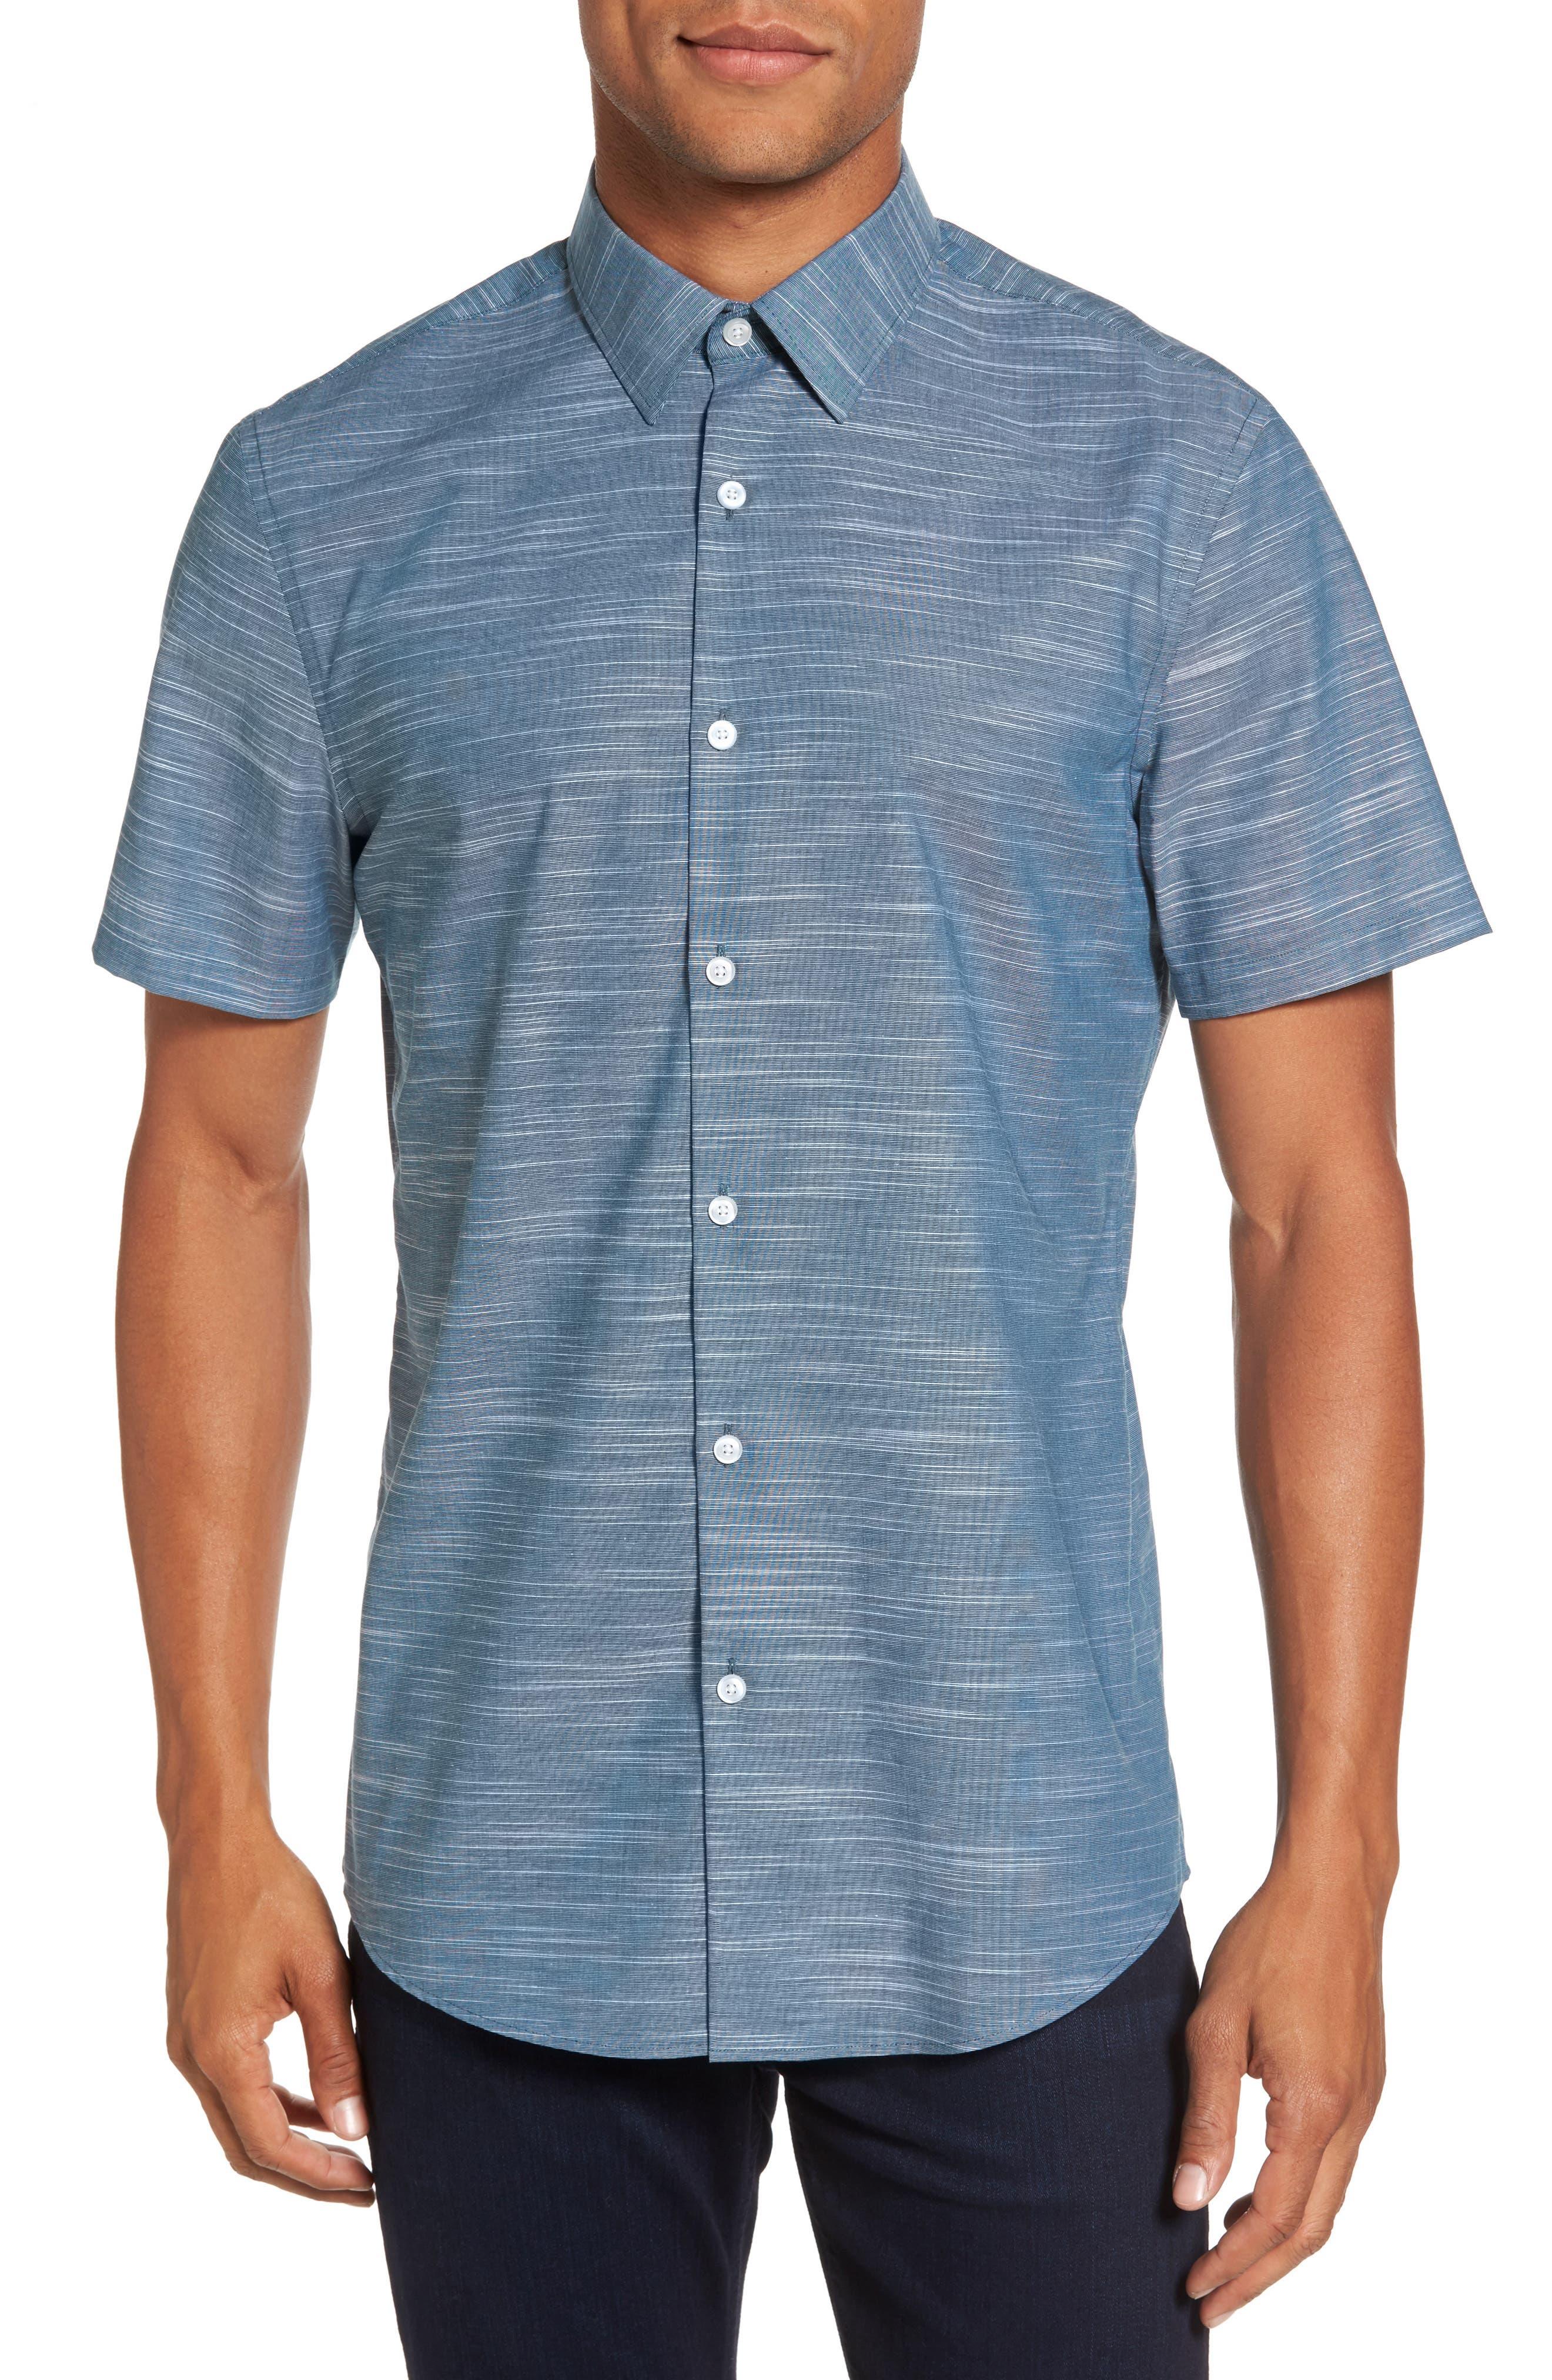 Calilbrate Slim Fit Slub Woven Shirt